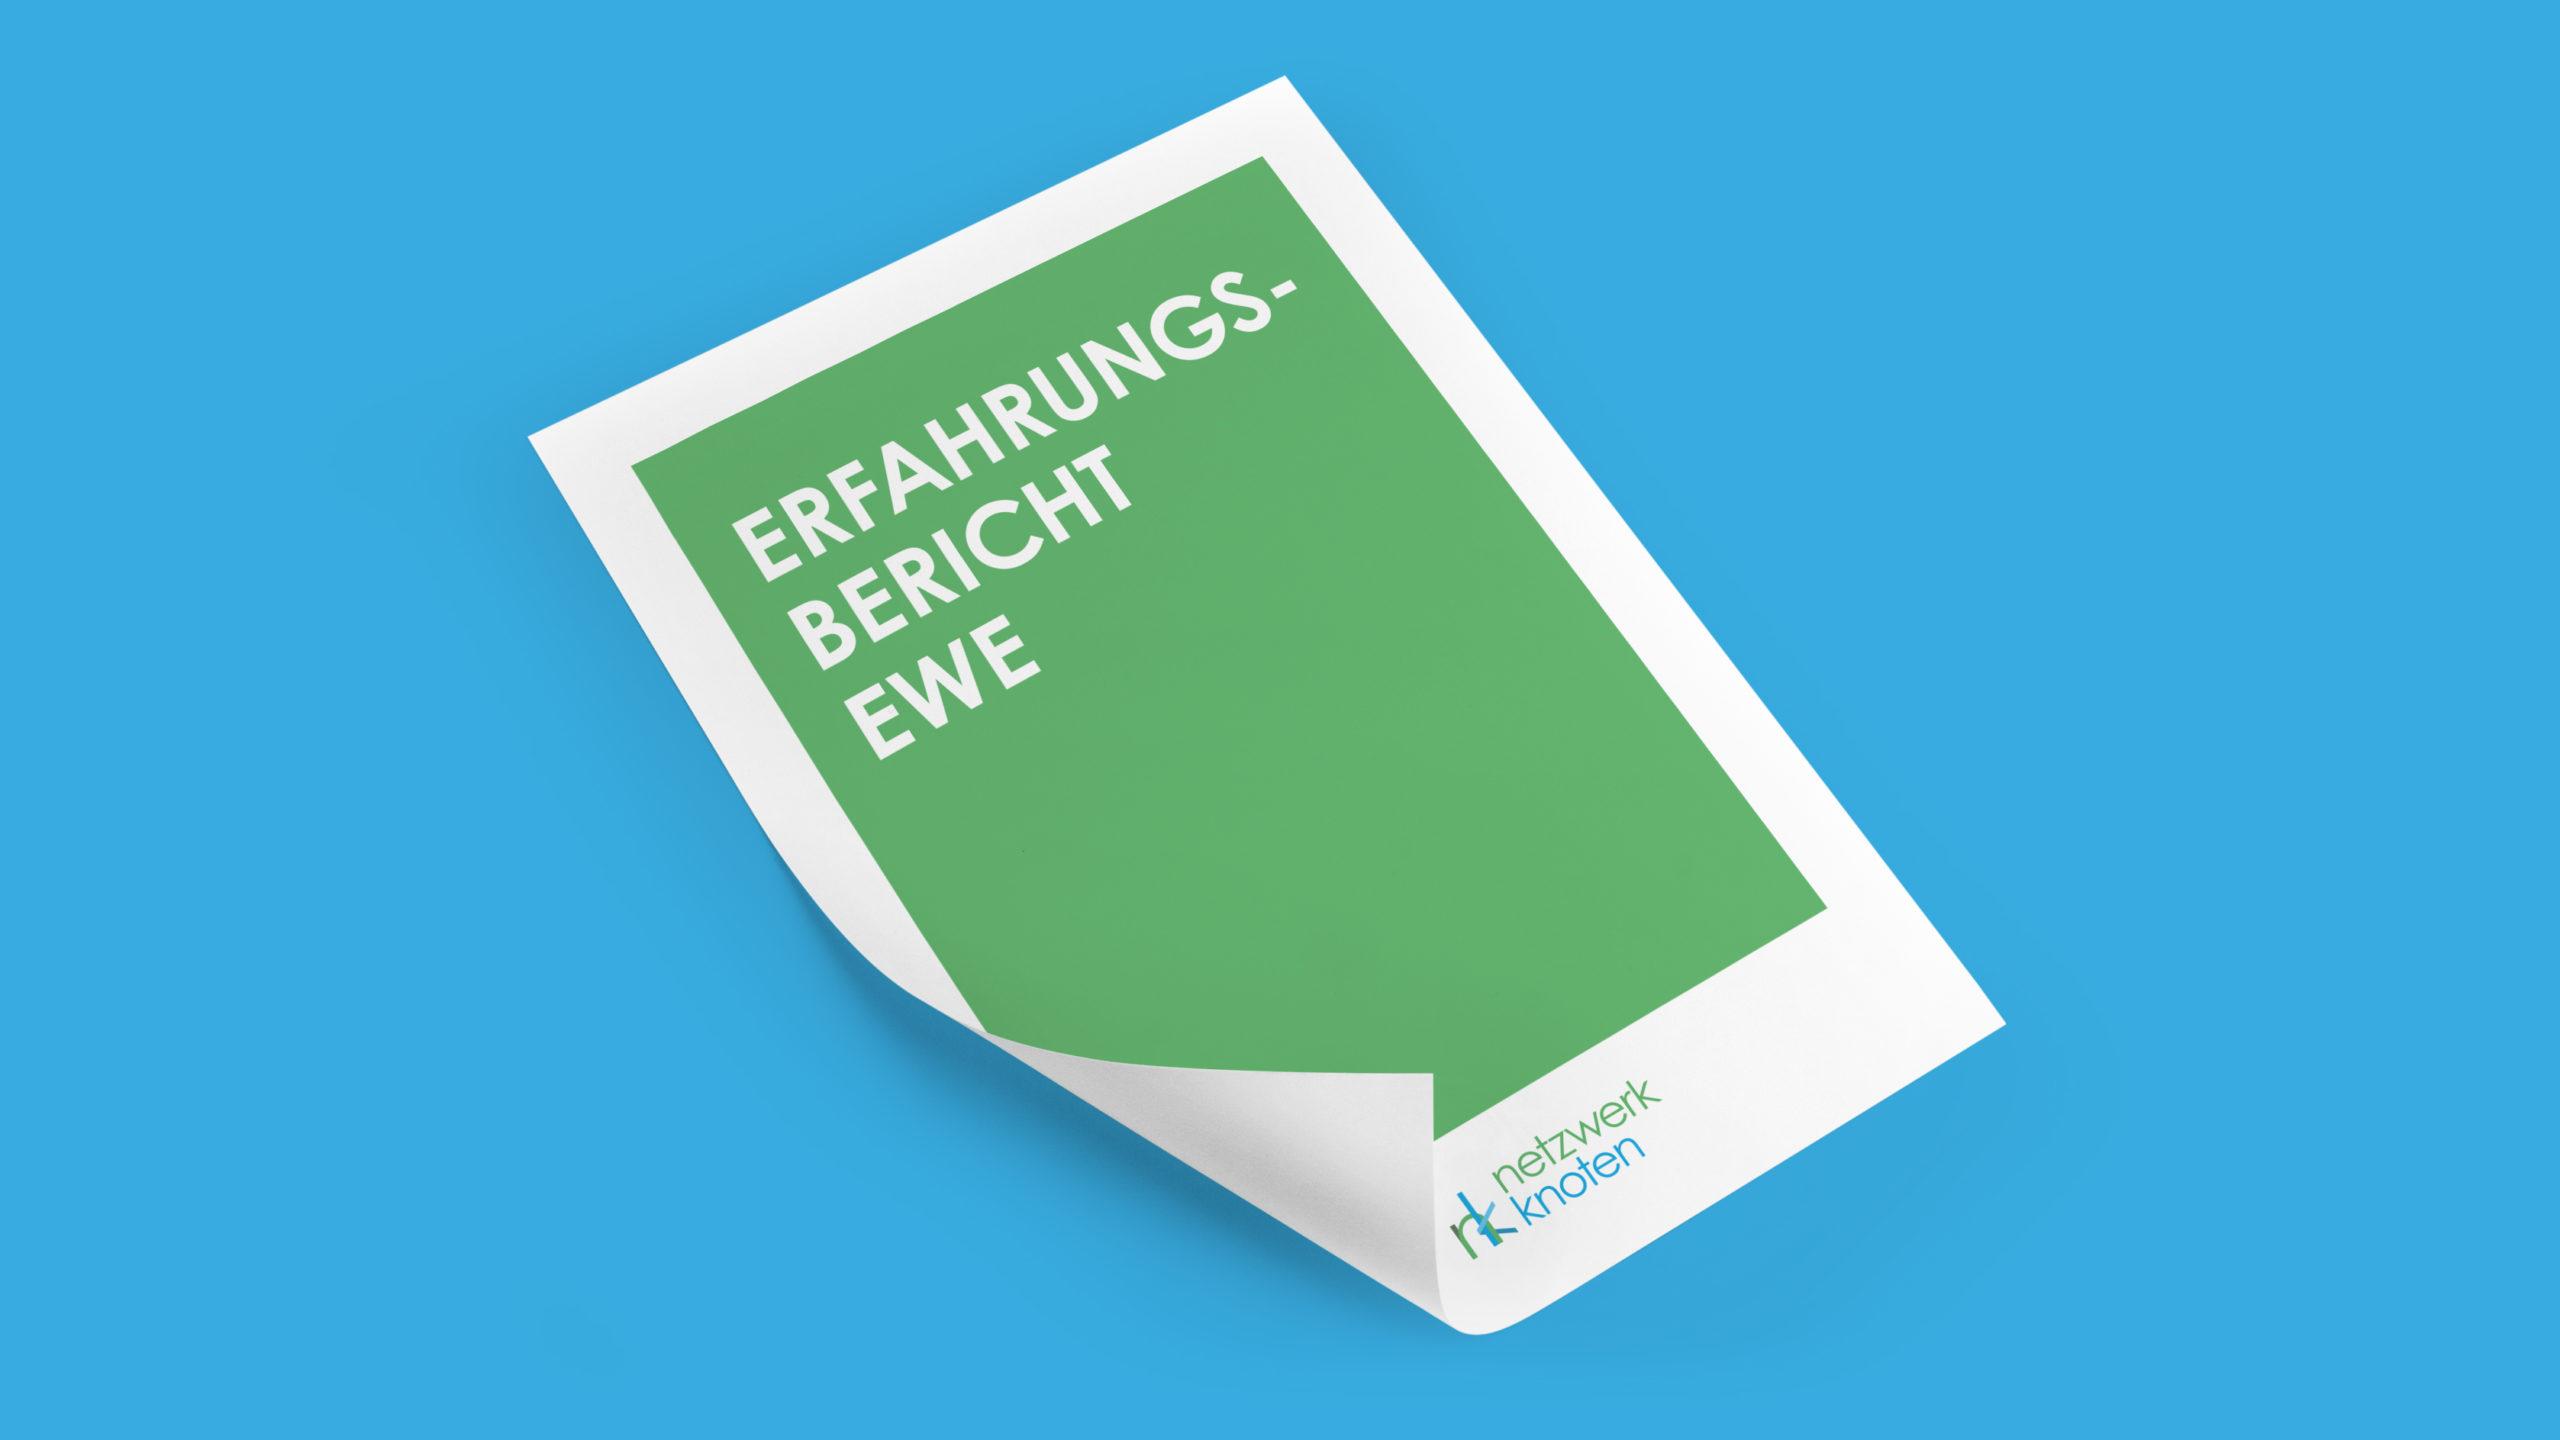 netzwerkknoten_unternehmensberatung_berlin_erfahrungsbericht_ewe